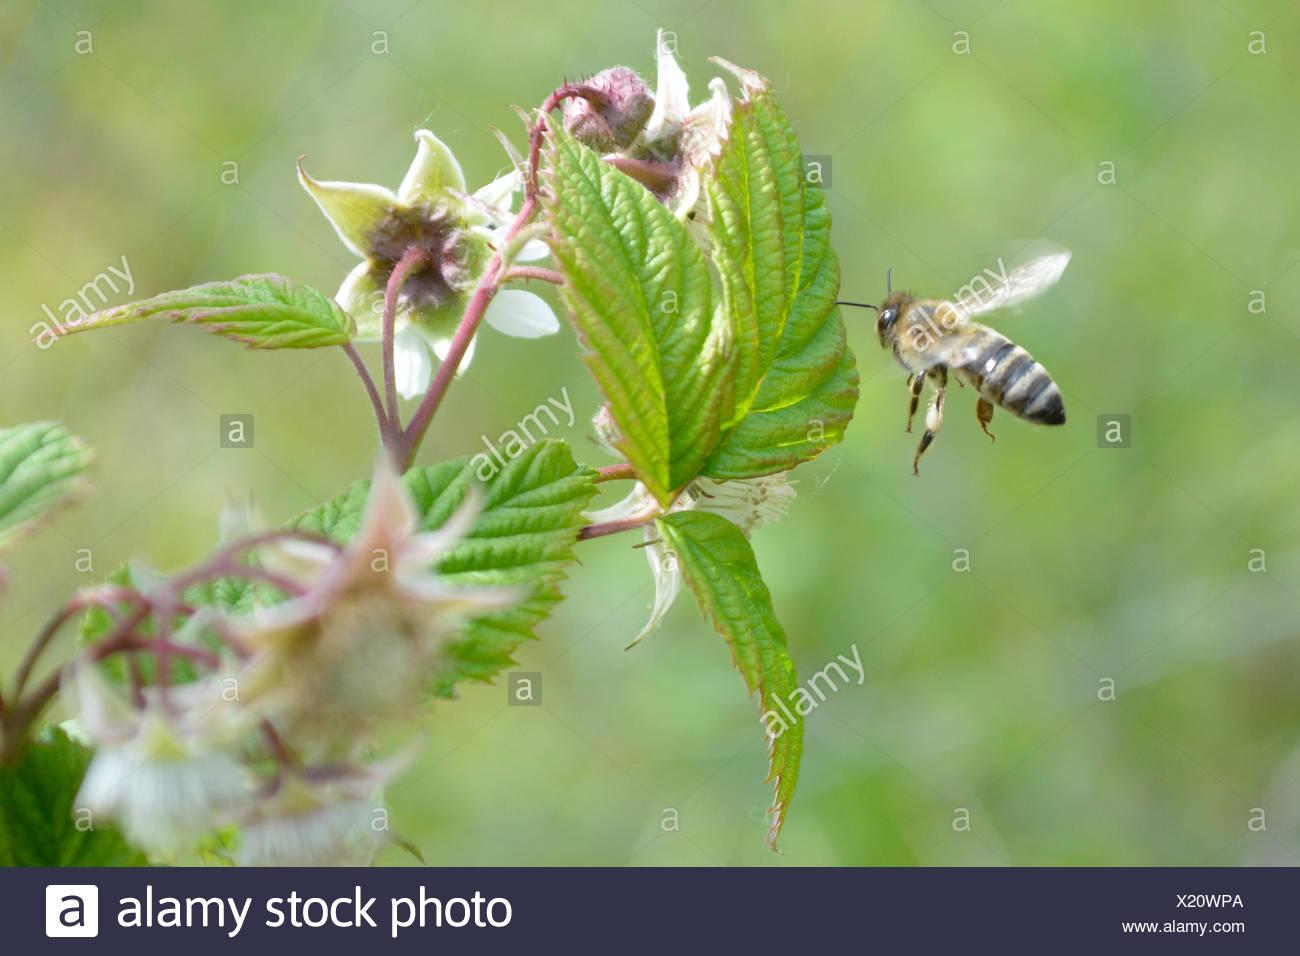 Honeybee flying to reach flower - Stock Image